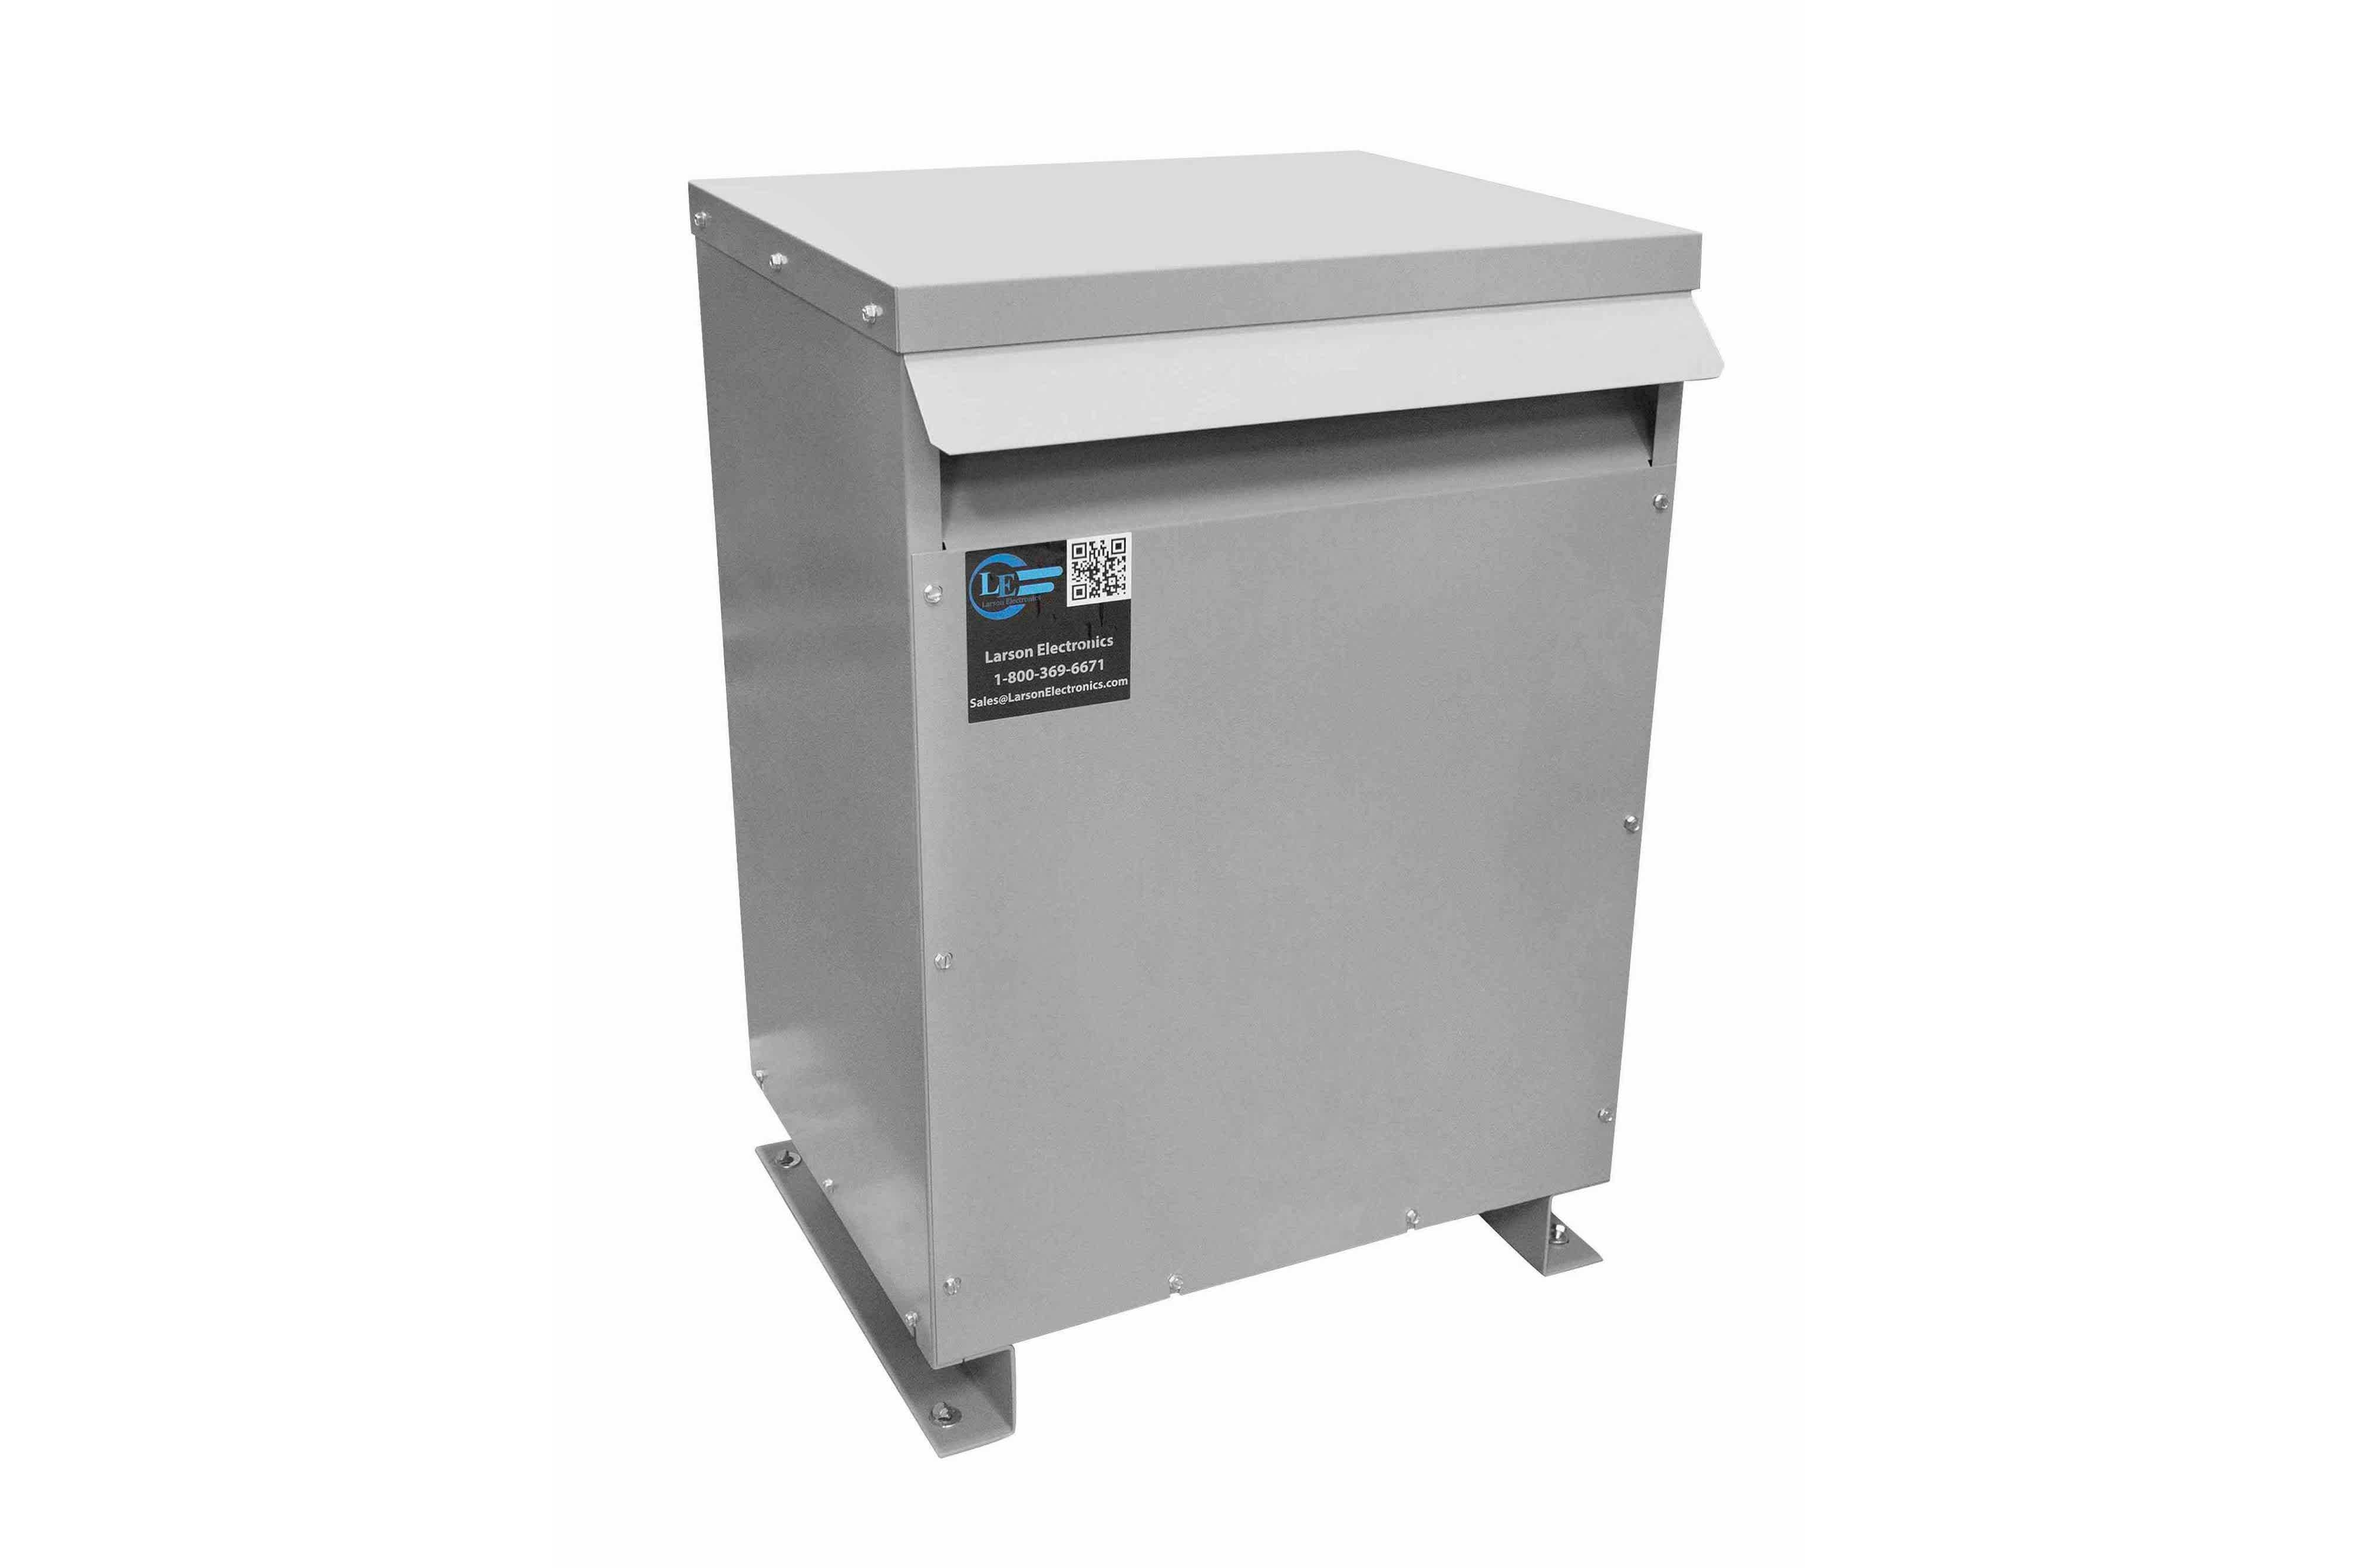 30 kVA 3PH Isolation Transformer, 230V Wye Primary, 208Y/120 Wye-N Secondary, N3R, Ventilated, 60 Hz